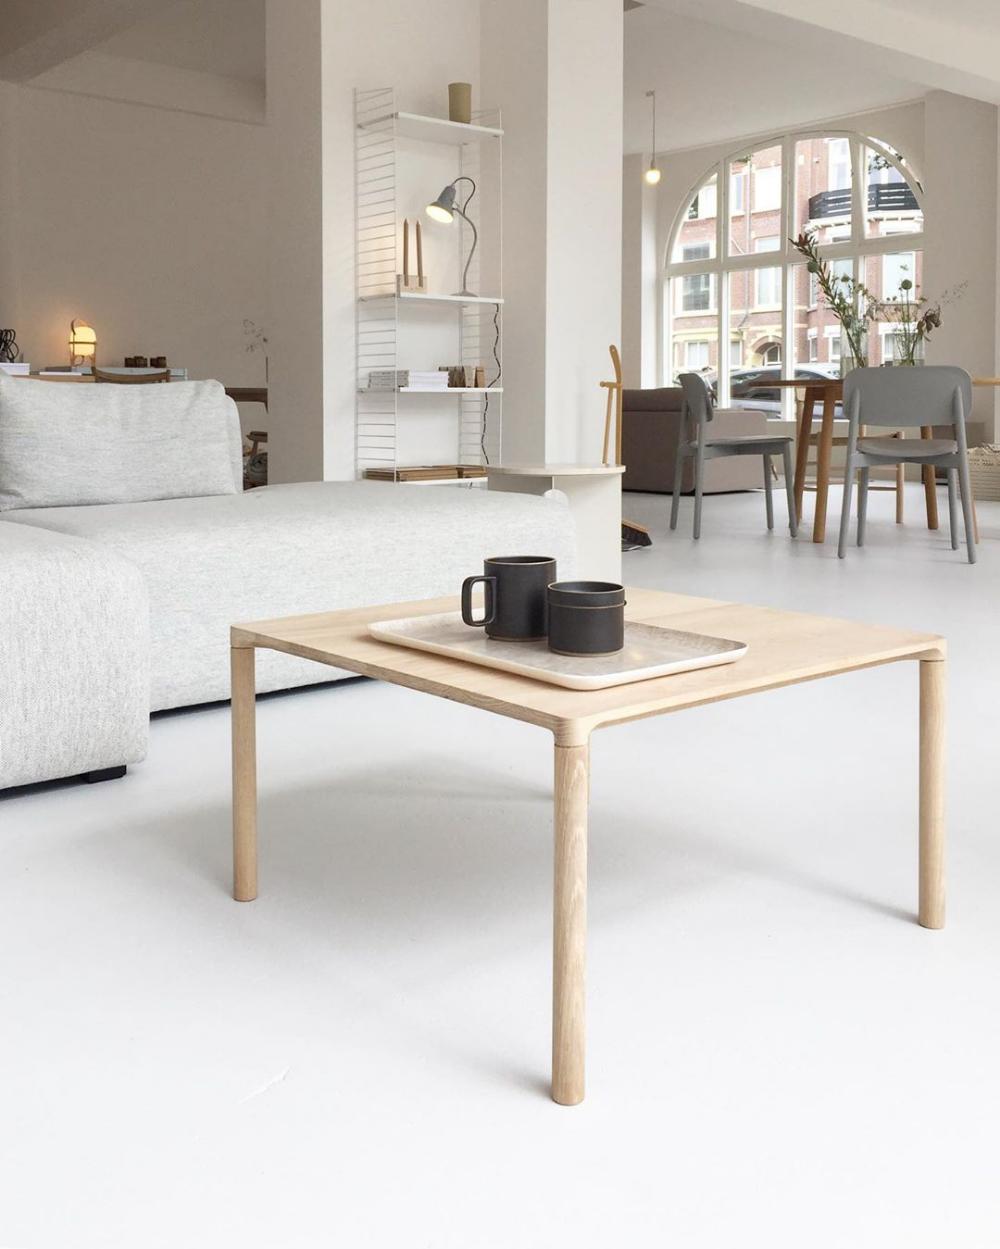 Fredericia Piloti Table Designed By Hugo Passos Image Via Thefinestore Fredericiafurniture Piloti Home Interior Design Lounge Interiors Interior Design [ 1249 x 1000 Pixel ]